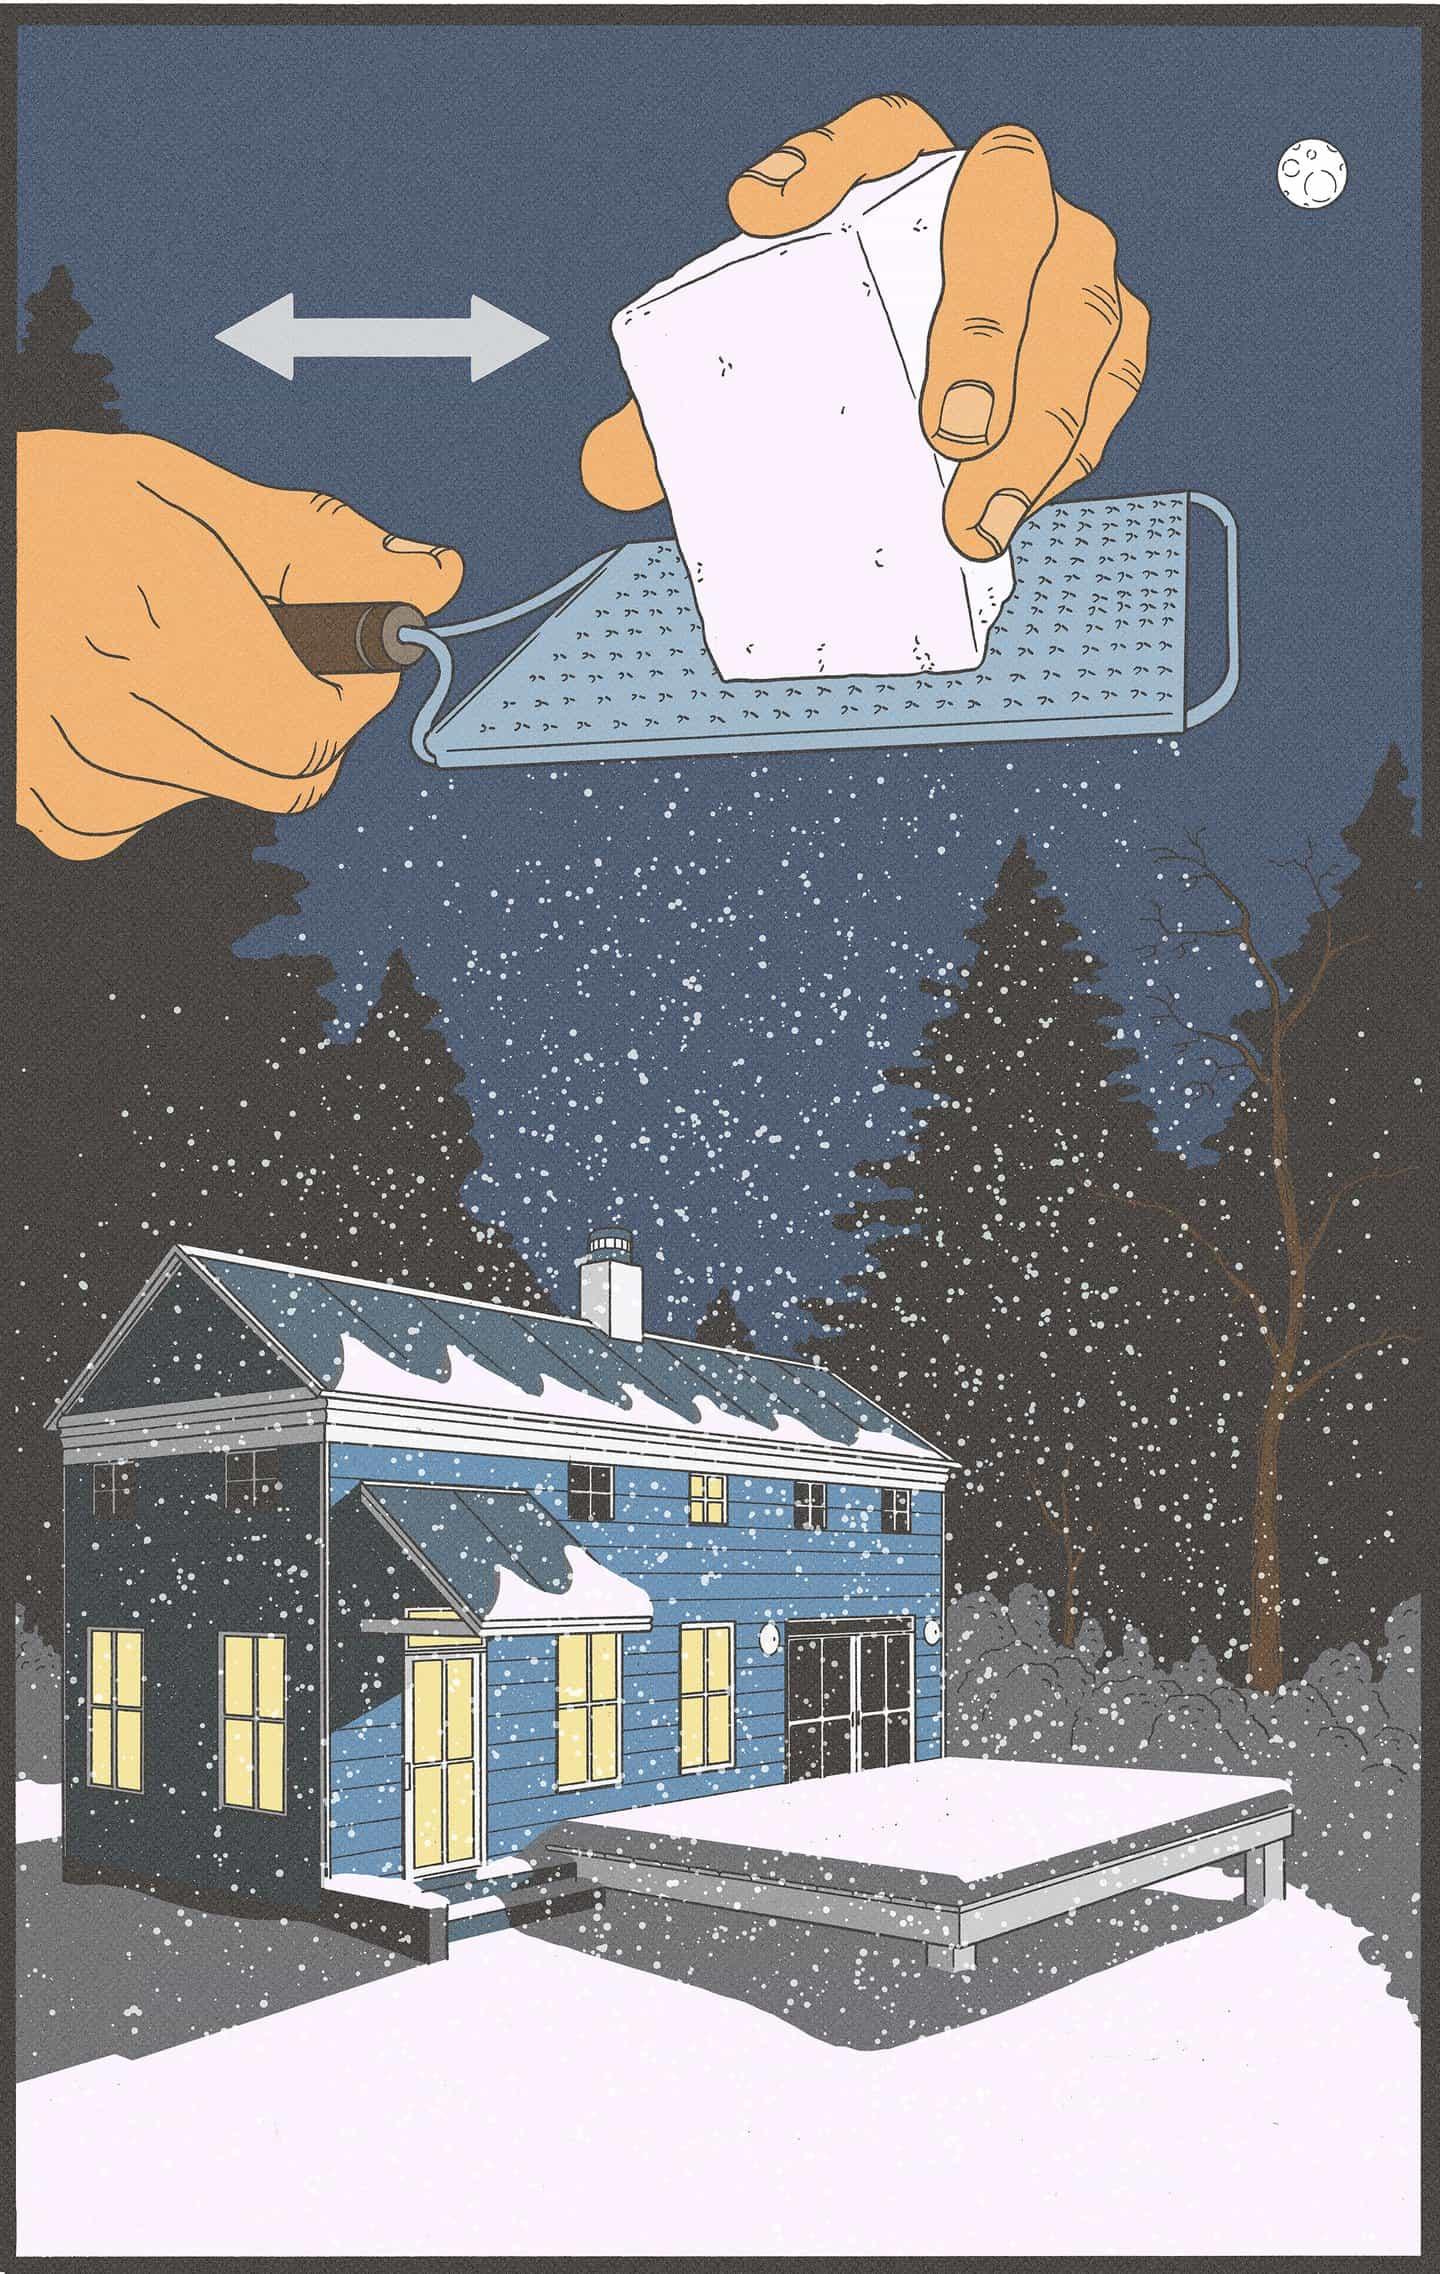 Kyle Ellingson: Ellingson's Dreams: Vol 1, New England White Cheddar (Copyright © Kyle Ellingson, 2021)